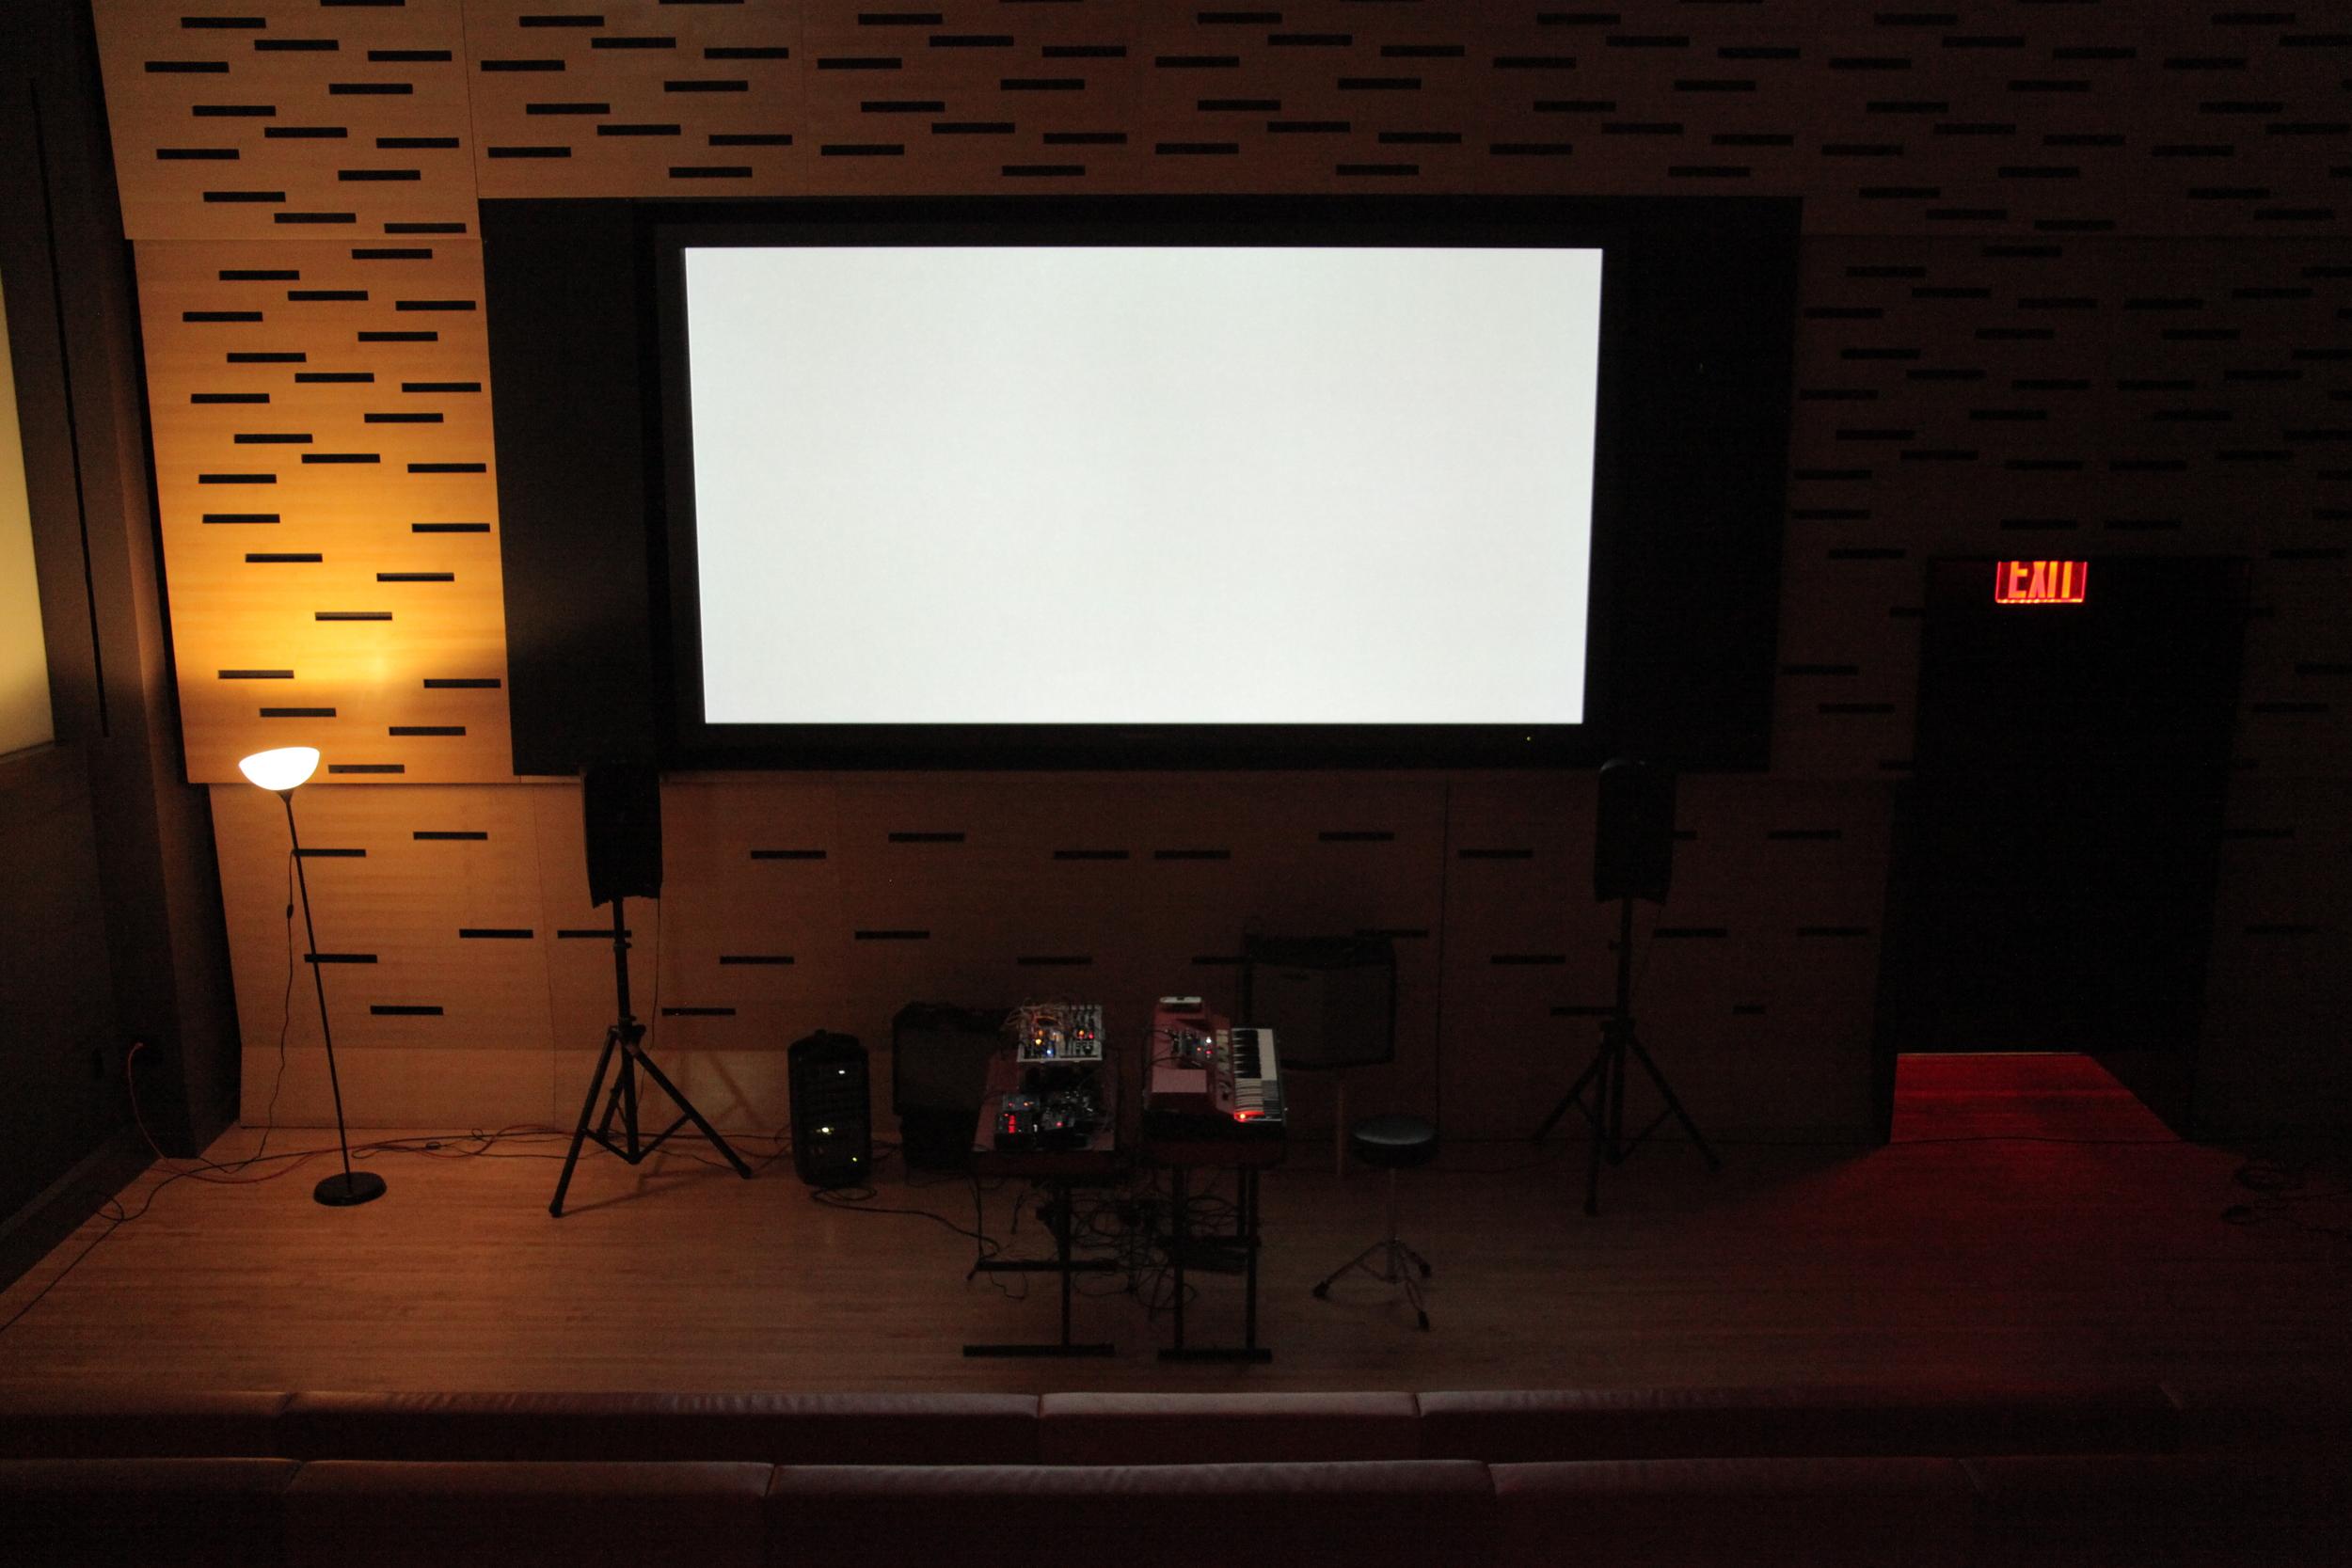 screen staring at sound